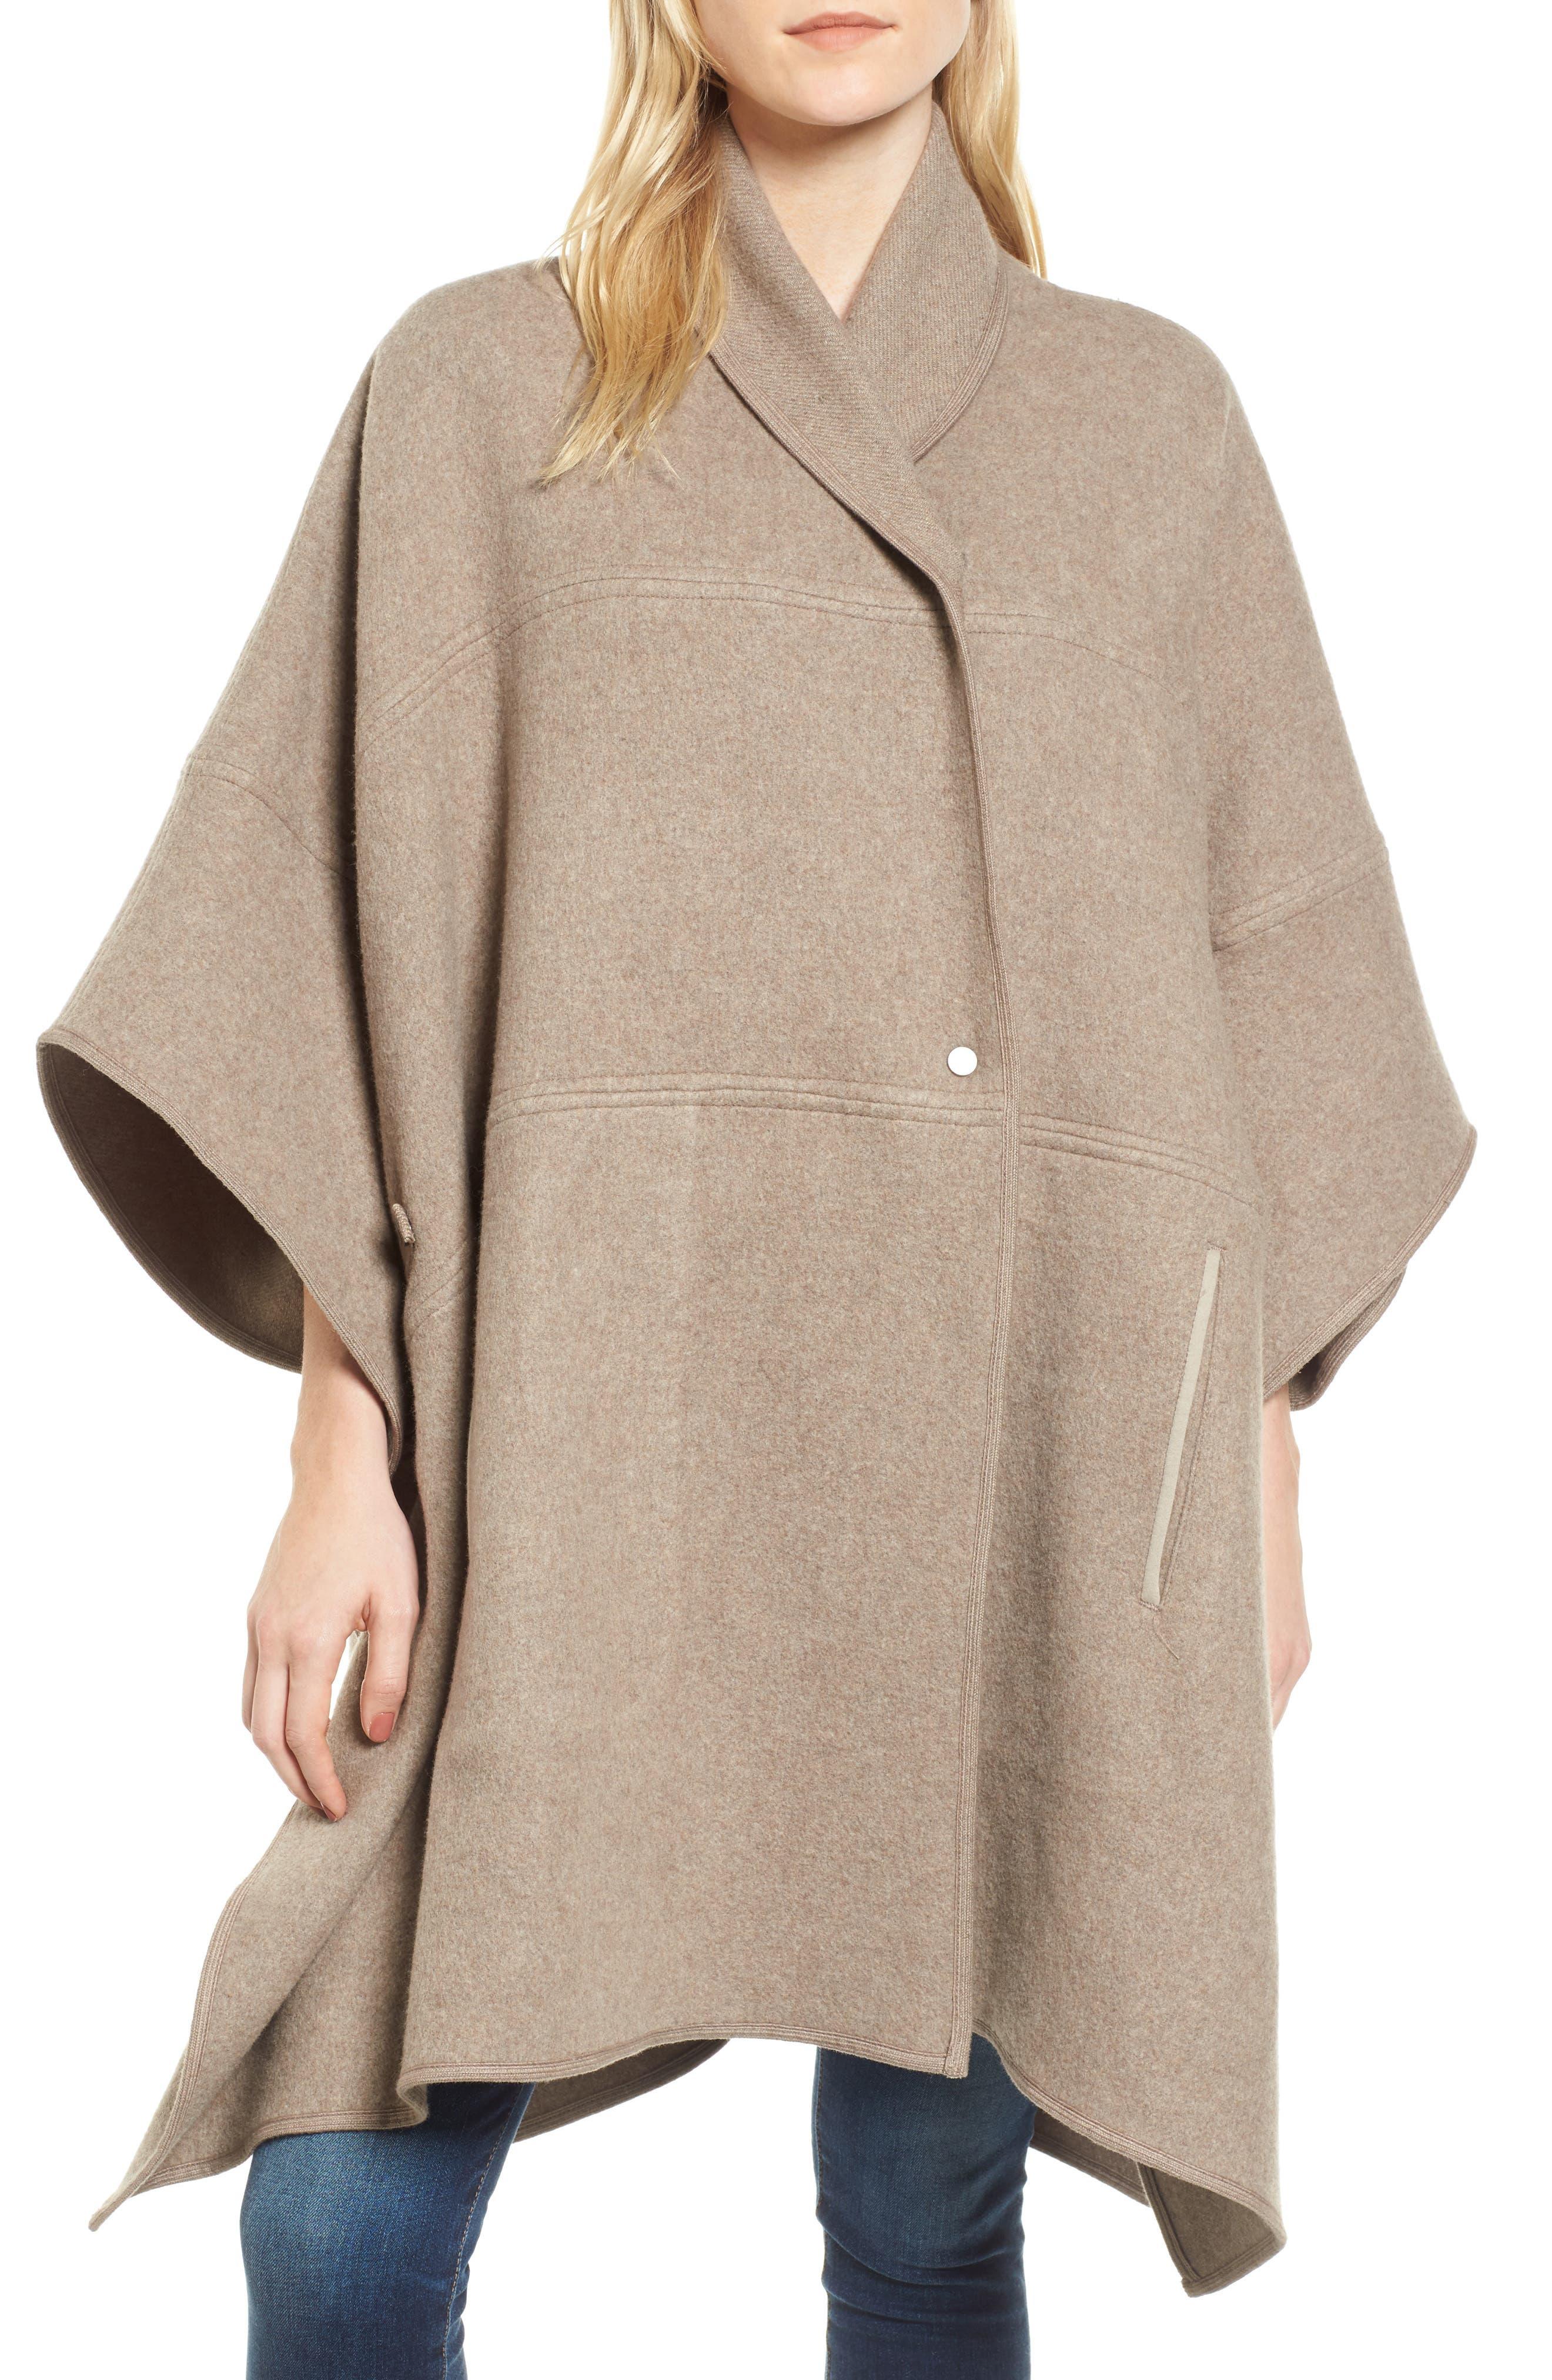 Nomad Blanket Coat,                             Main thumbnail 1, color,                             243